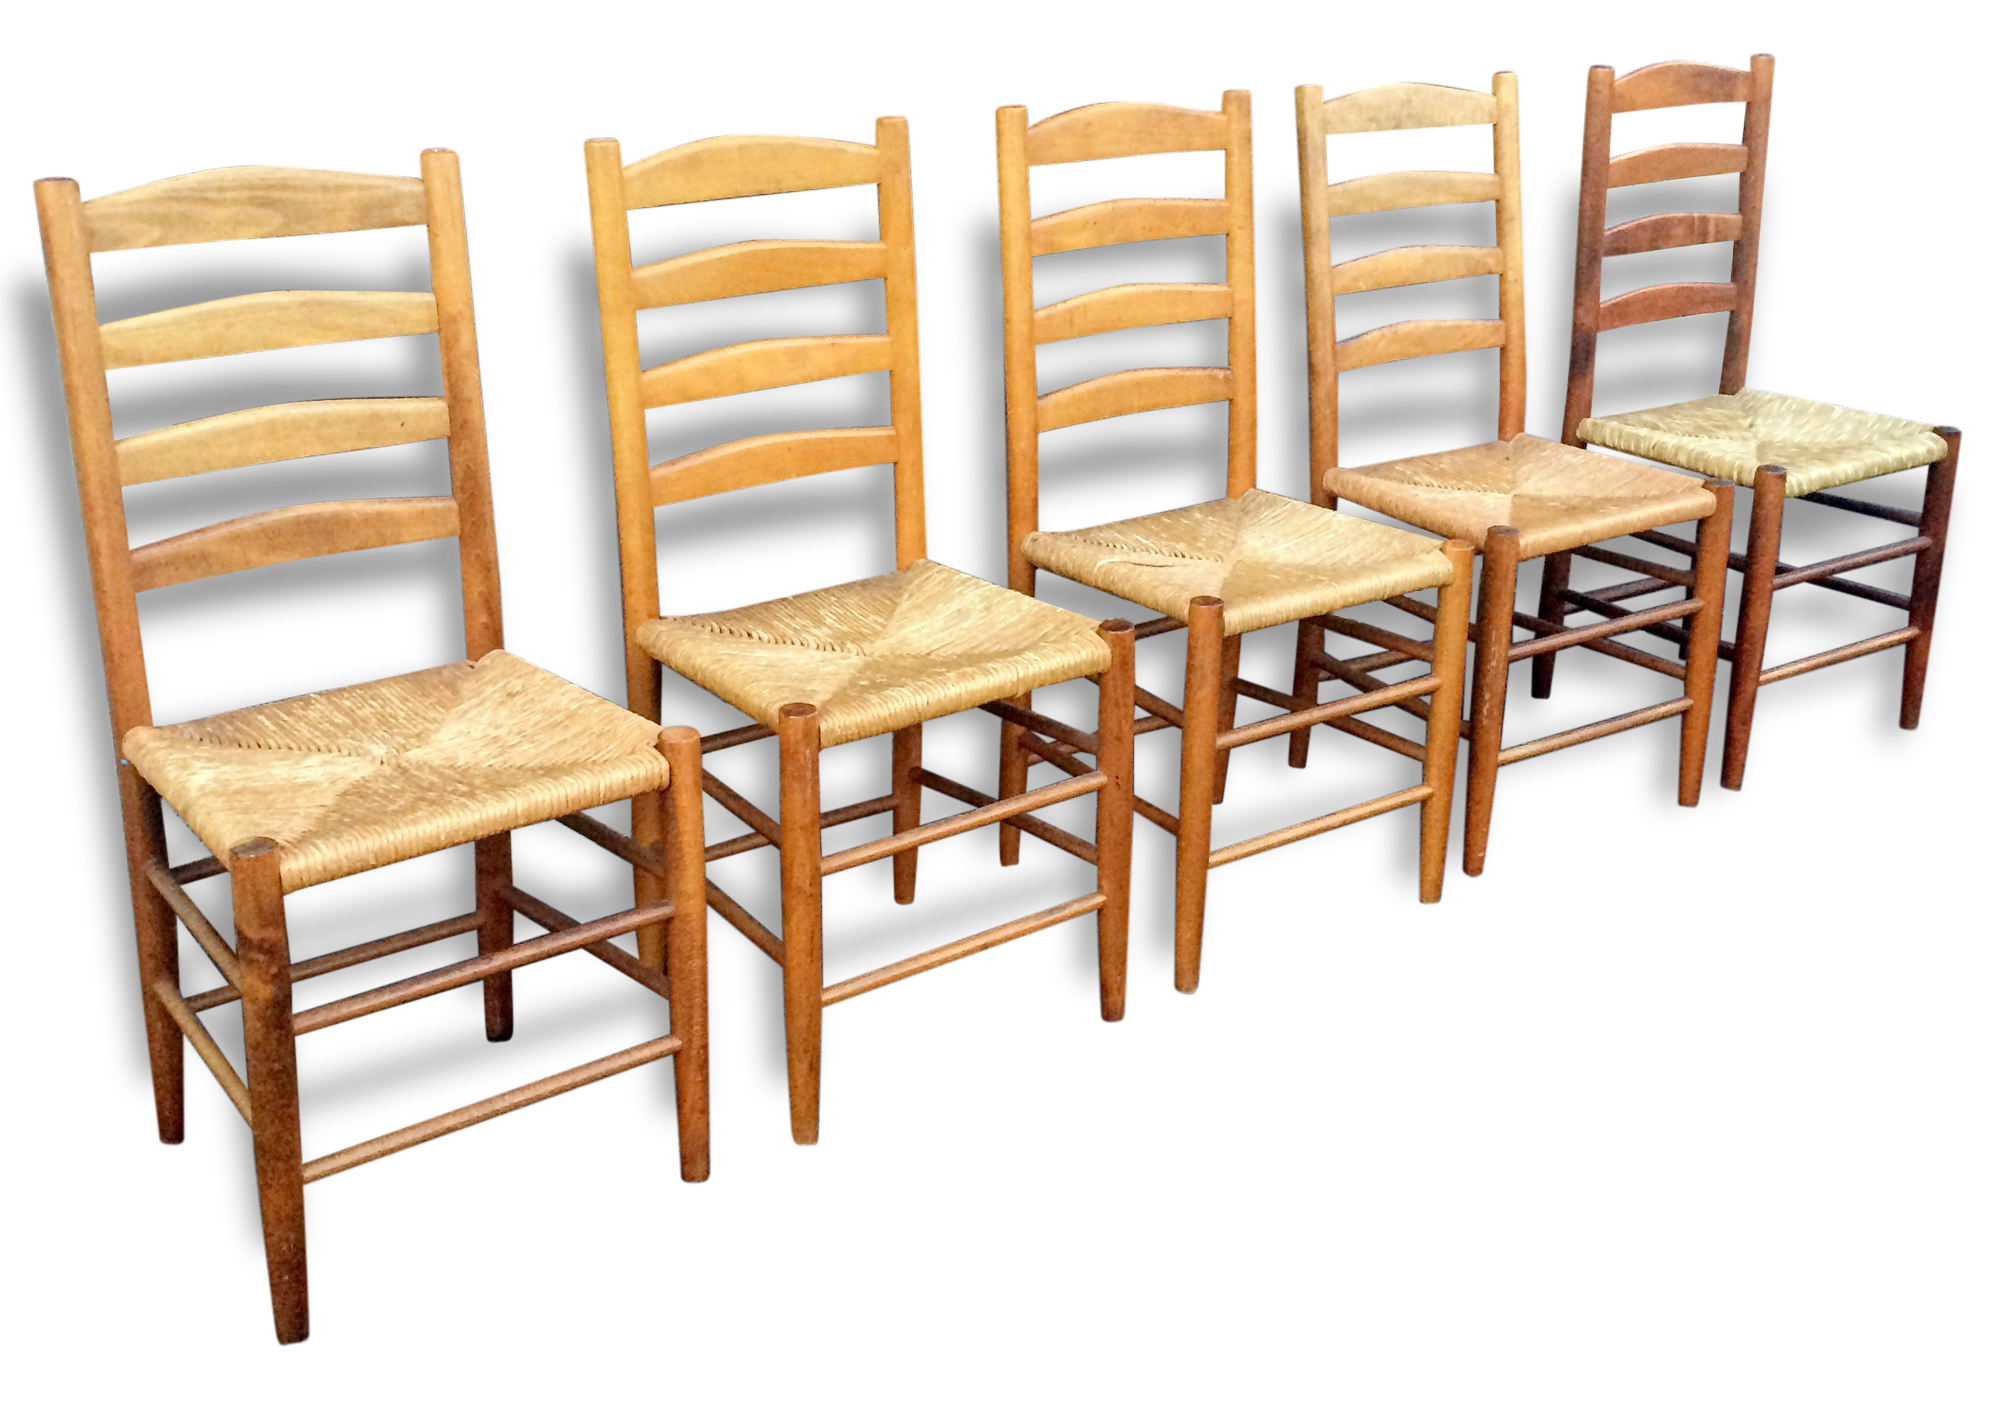 chaises paillees great chaise thonet rempaille en couleur htre courbe with chaises paillees. Black Bedroom Furniture Sets. Home Design Ideas